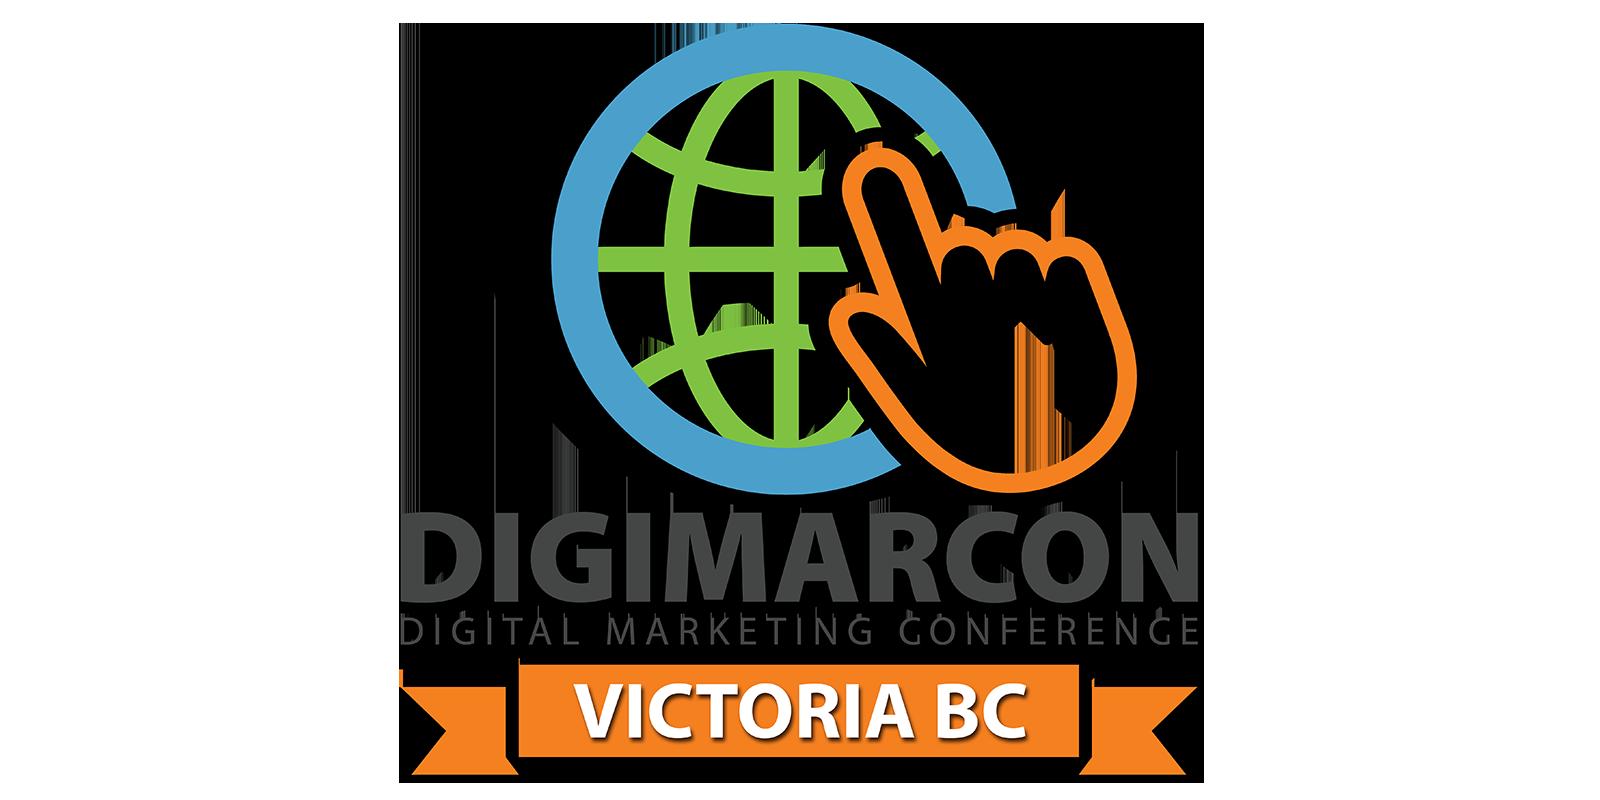 Victoria BC Digital Marketing Conference